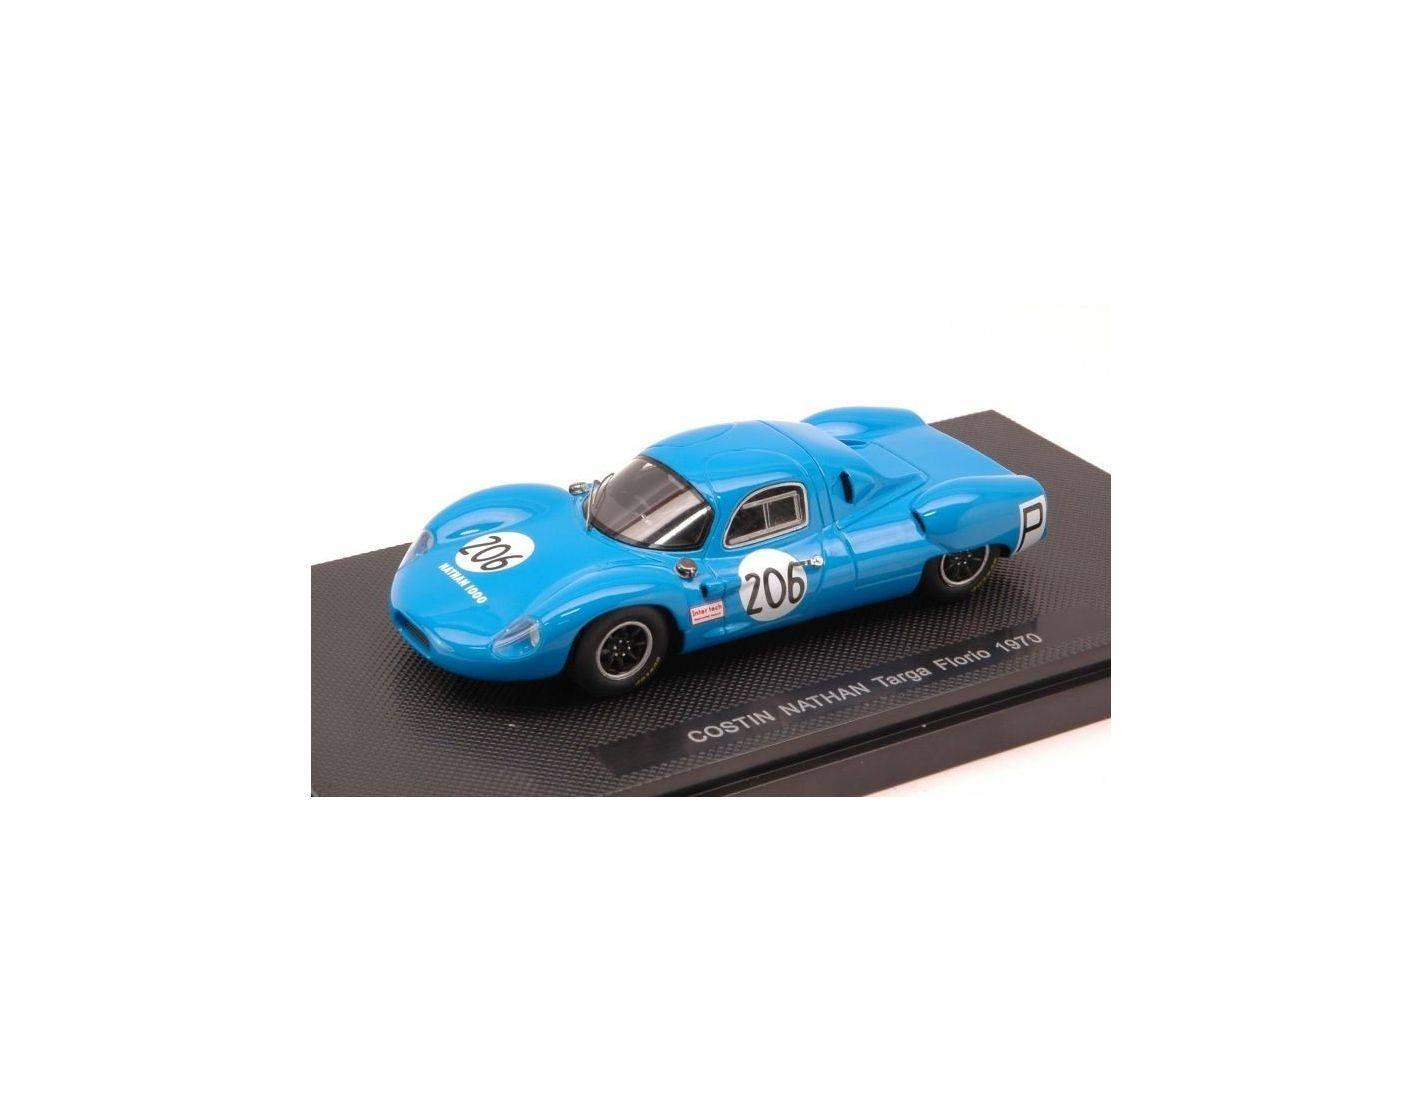 Hunter 1:43 Model Markey Costin Nathan #206 46th Targa Florio 1970 Martin